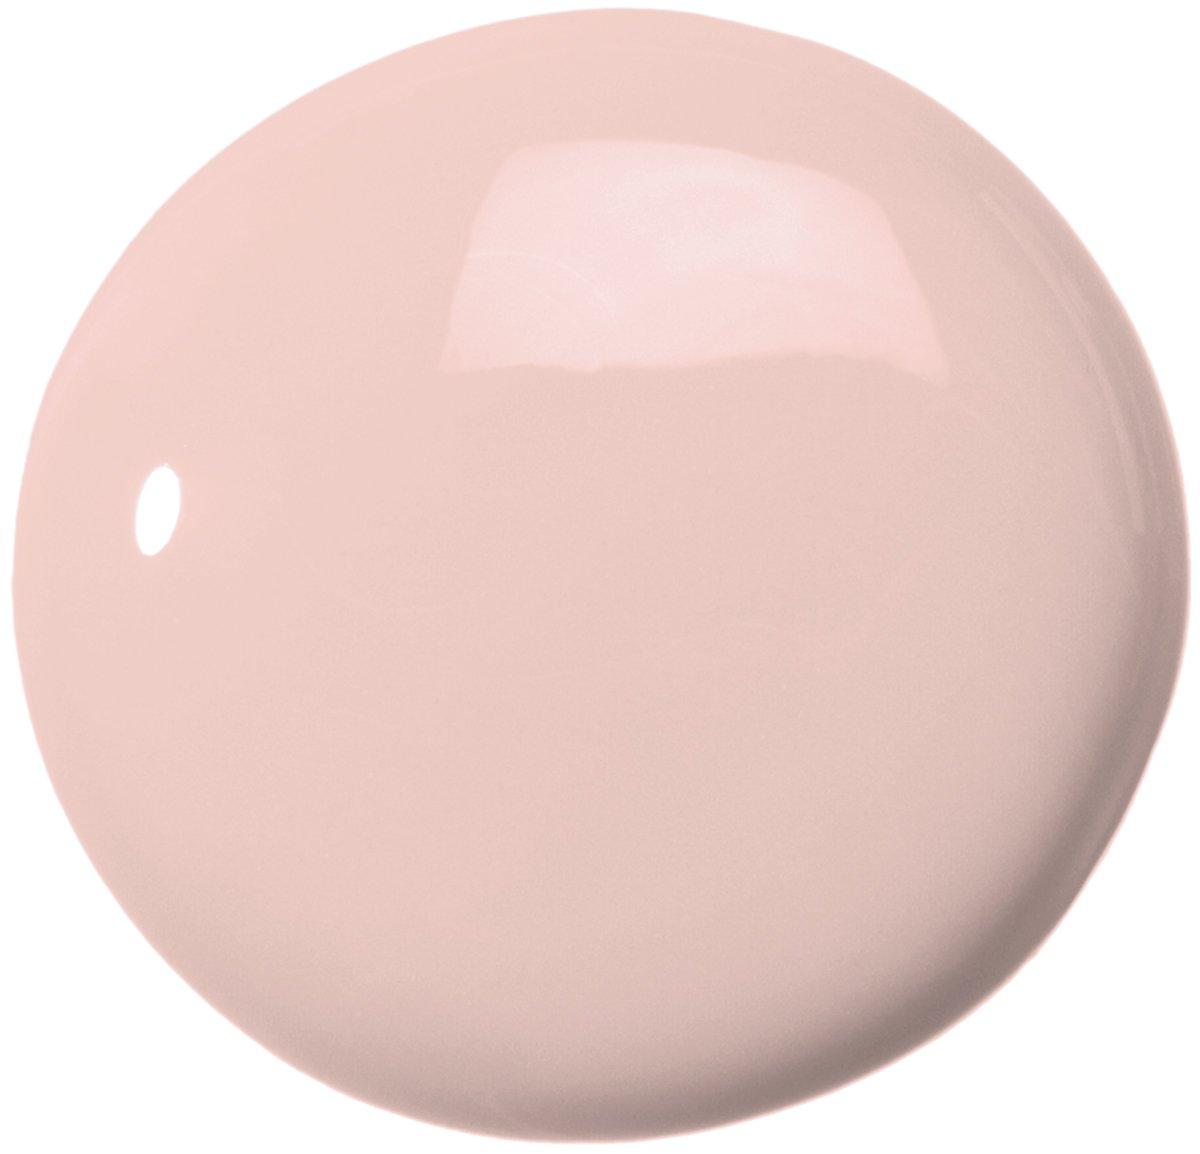 OPI Nail Lacquer, Bubble Bath, 0.5 fl.oz. by OPI (Image #3)